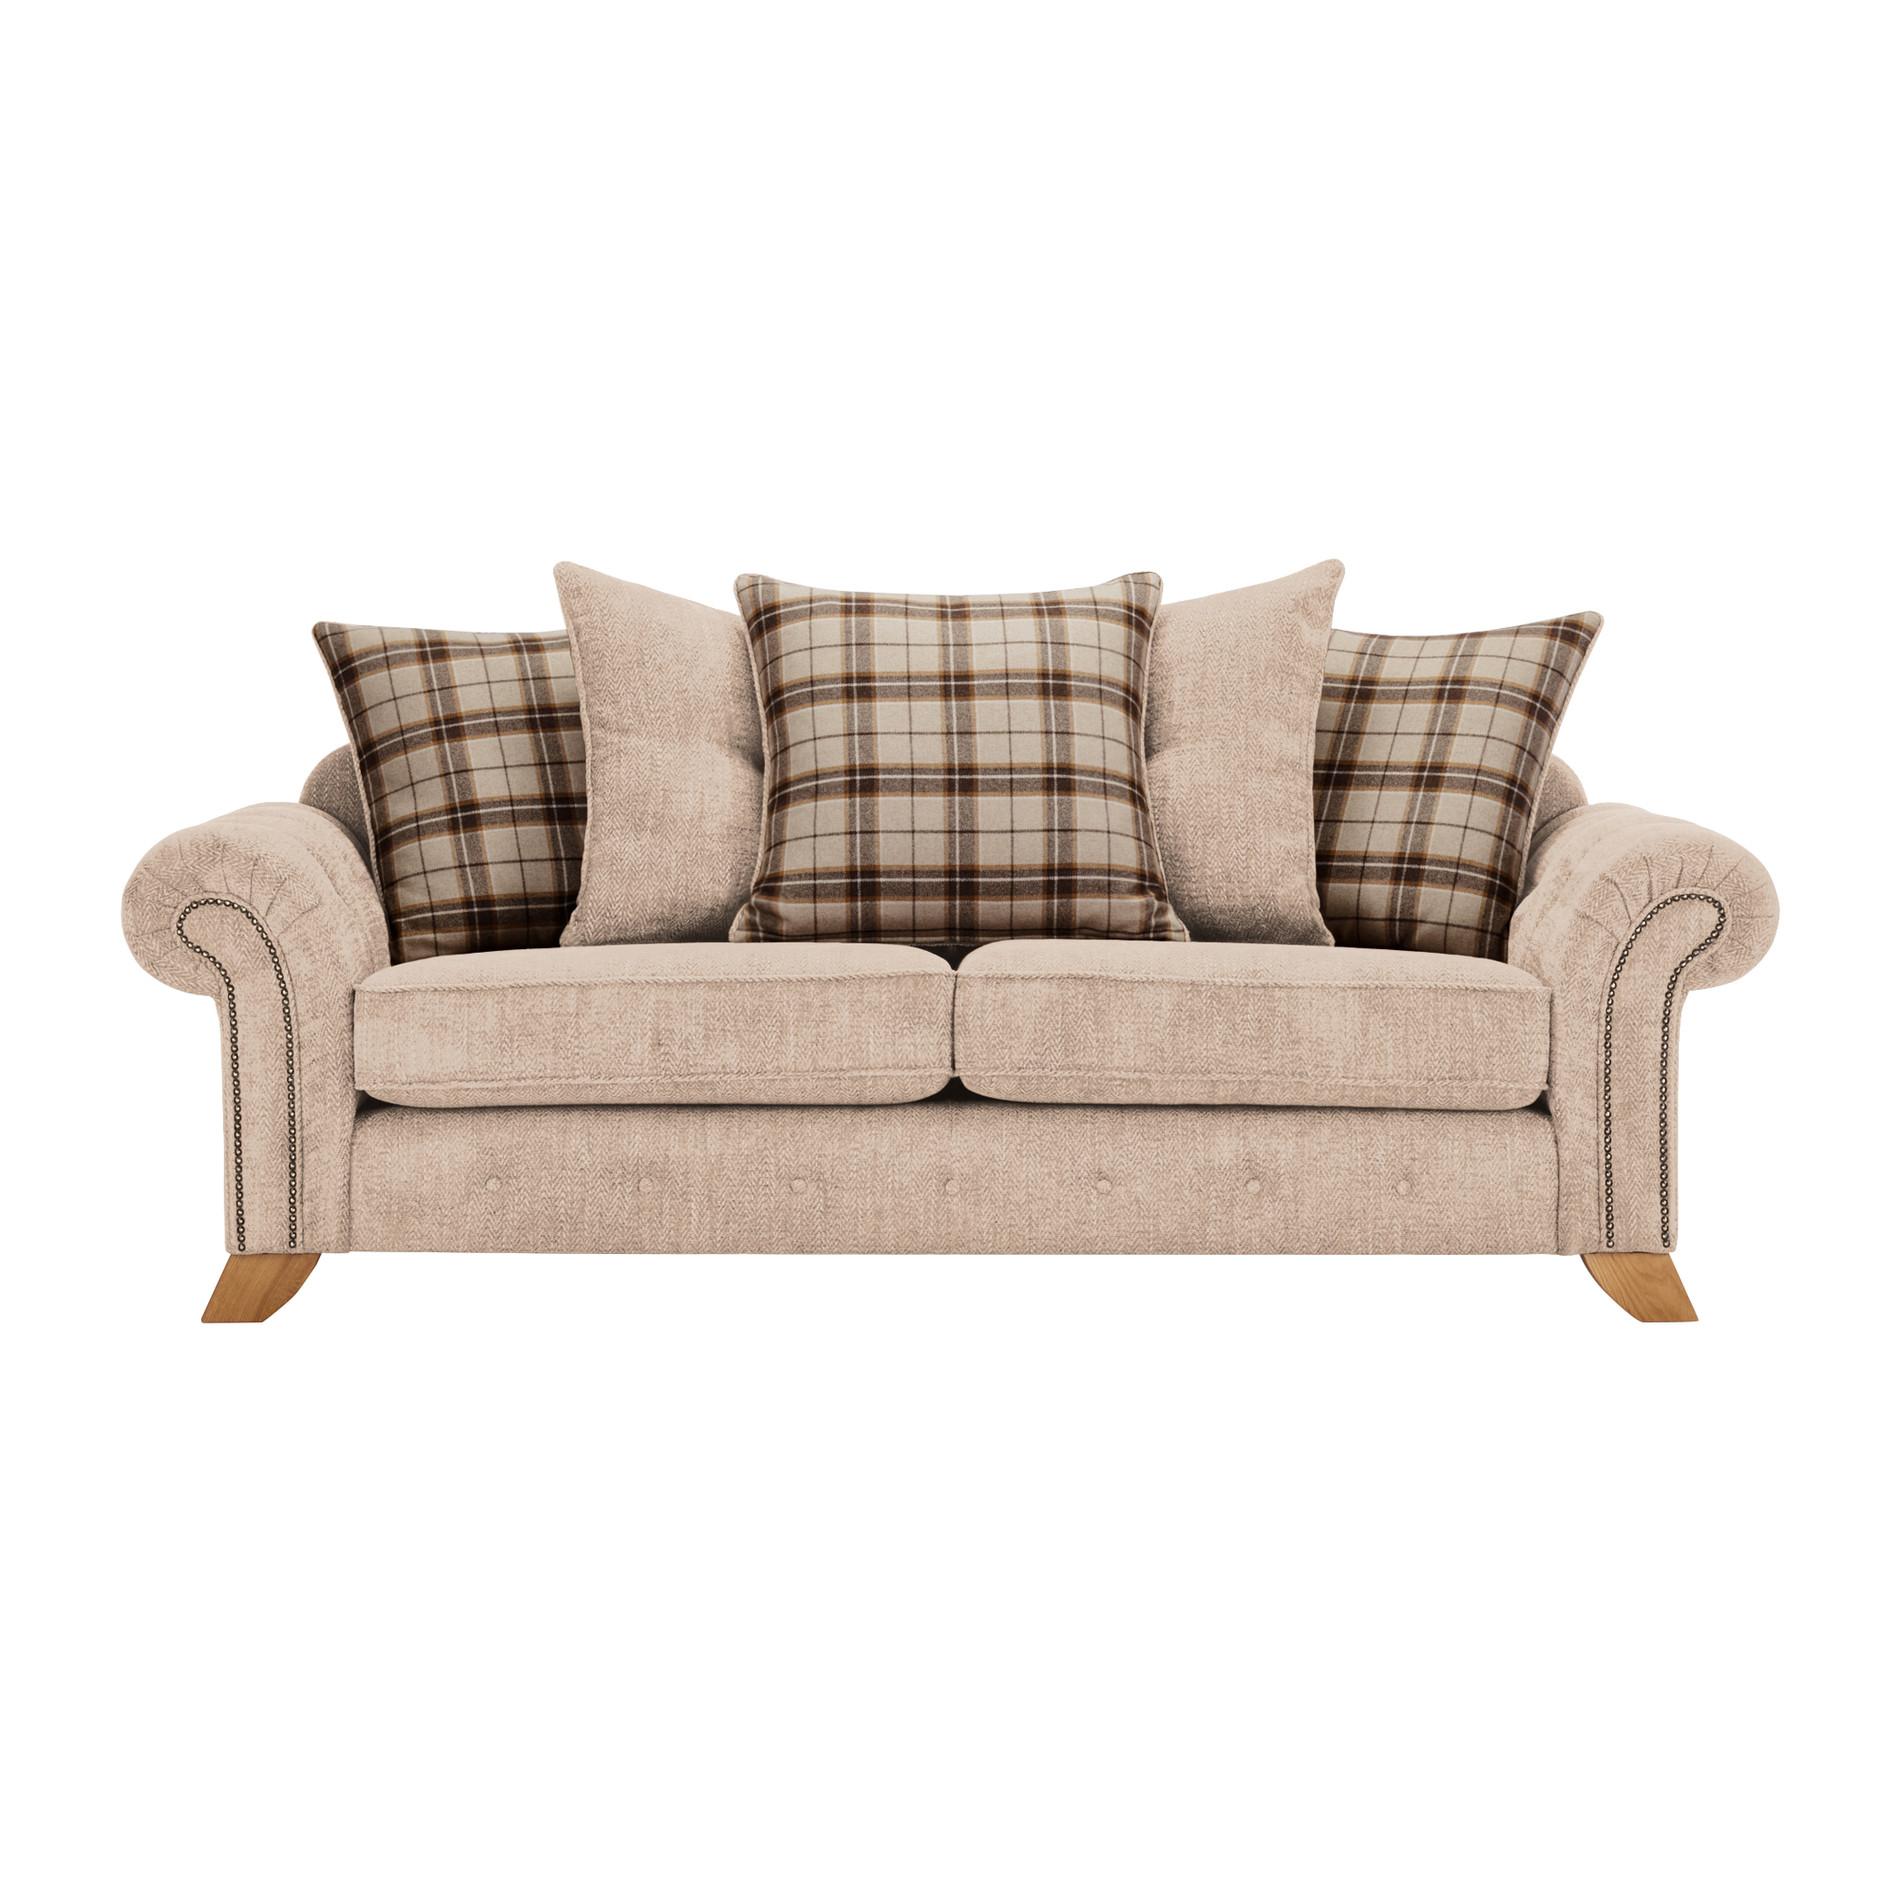 Montana 3 Seater Pillow Back Sofa in Beige Tartan Cushions